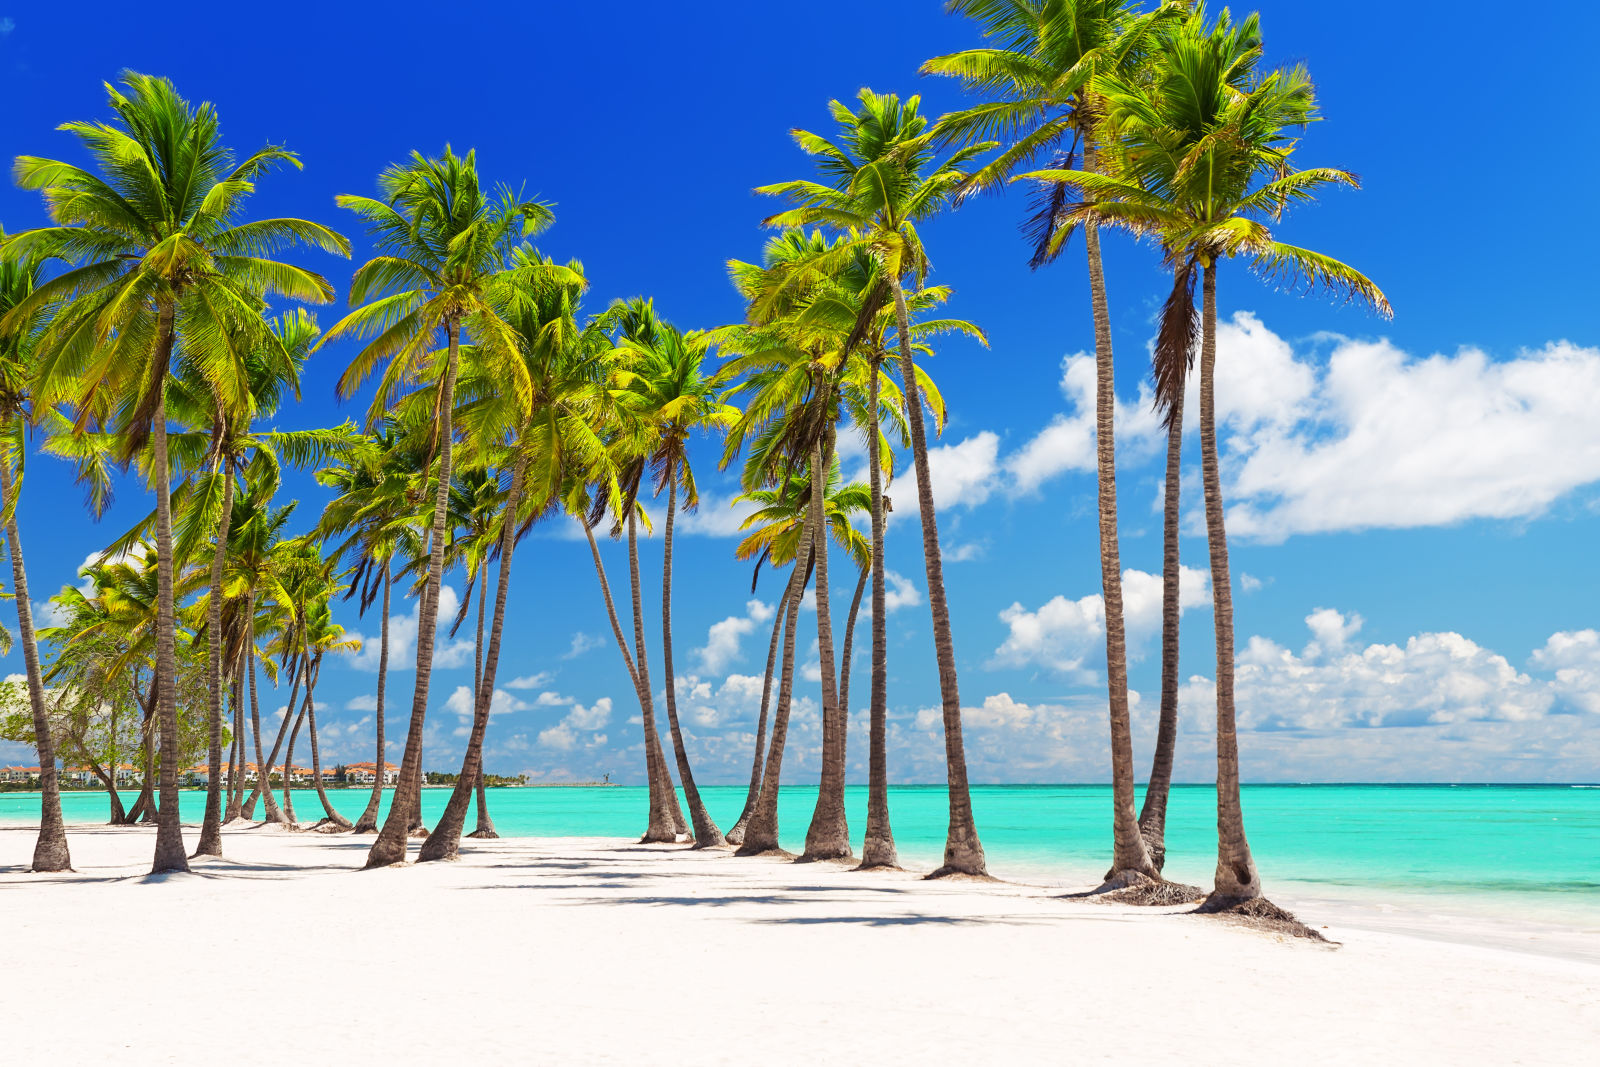 Kokospalmen am weißen Sandstrand in Punta Cana, Dominikanische Republik